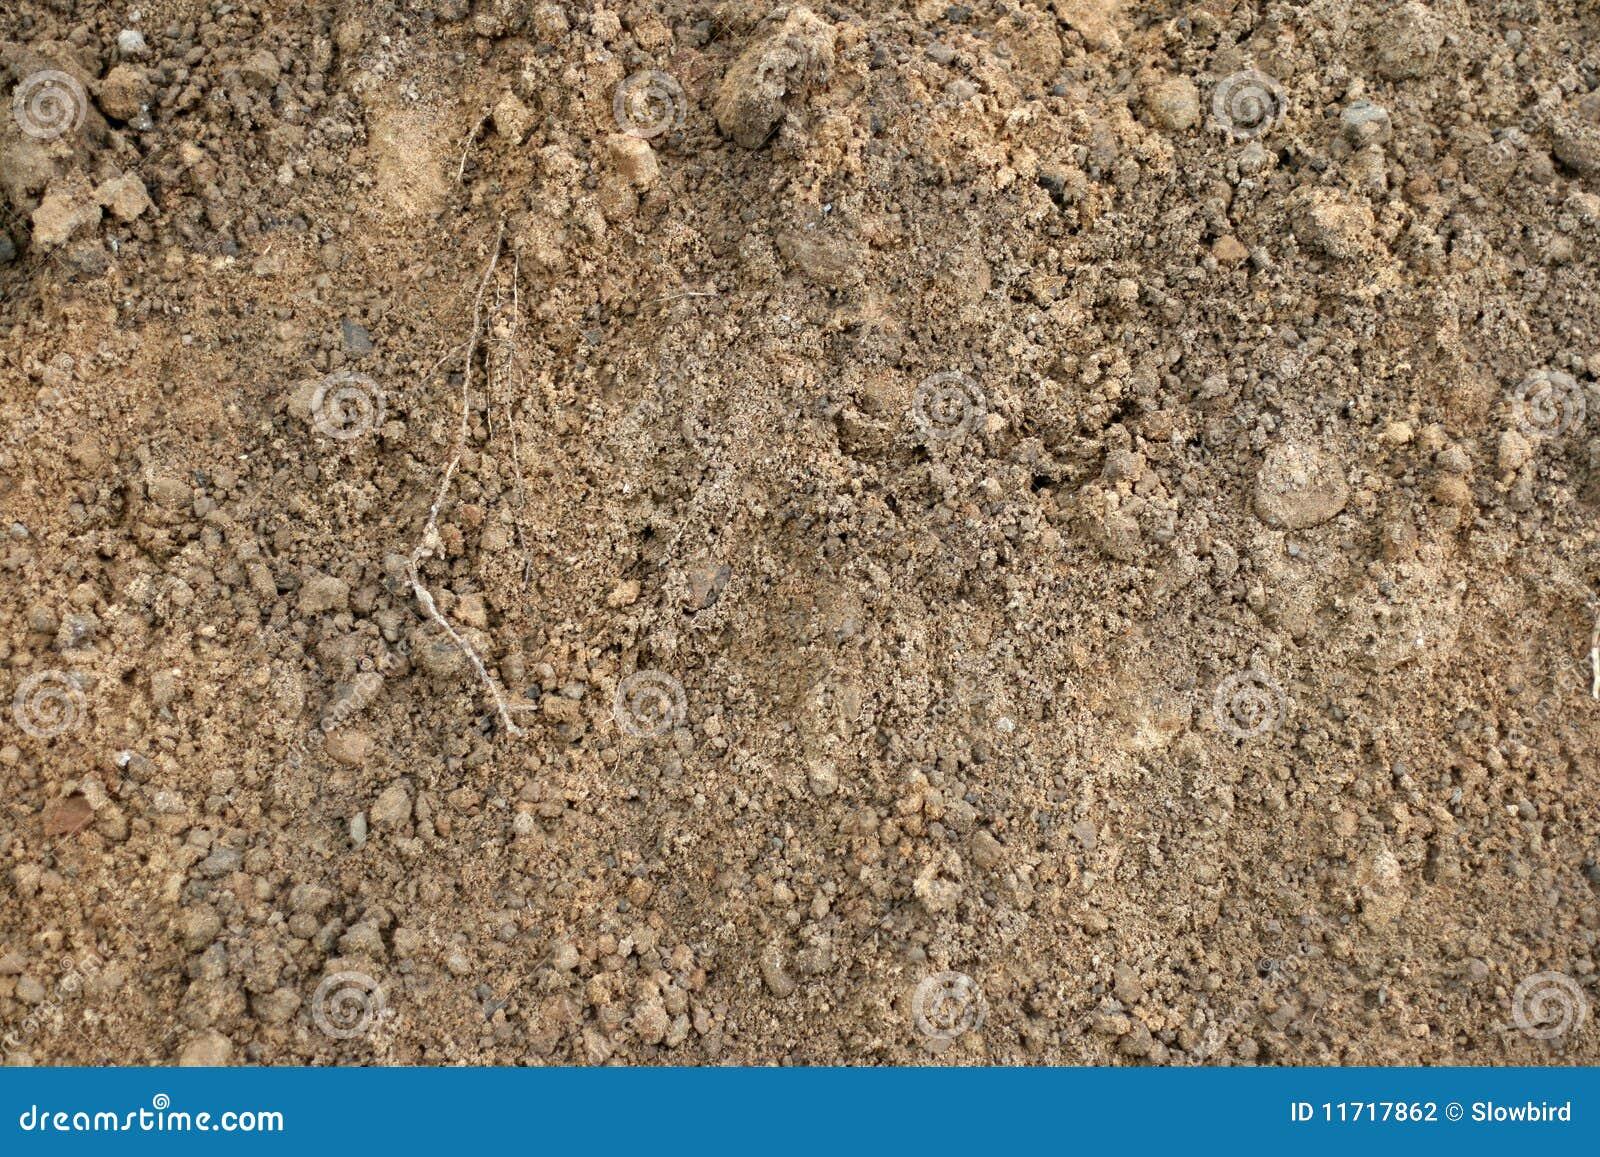 Soil stock photography image 11717862 for The soil 02joy